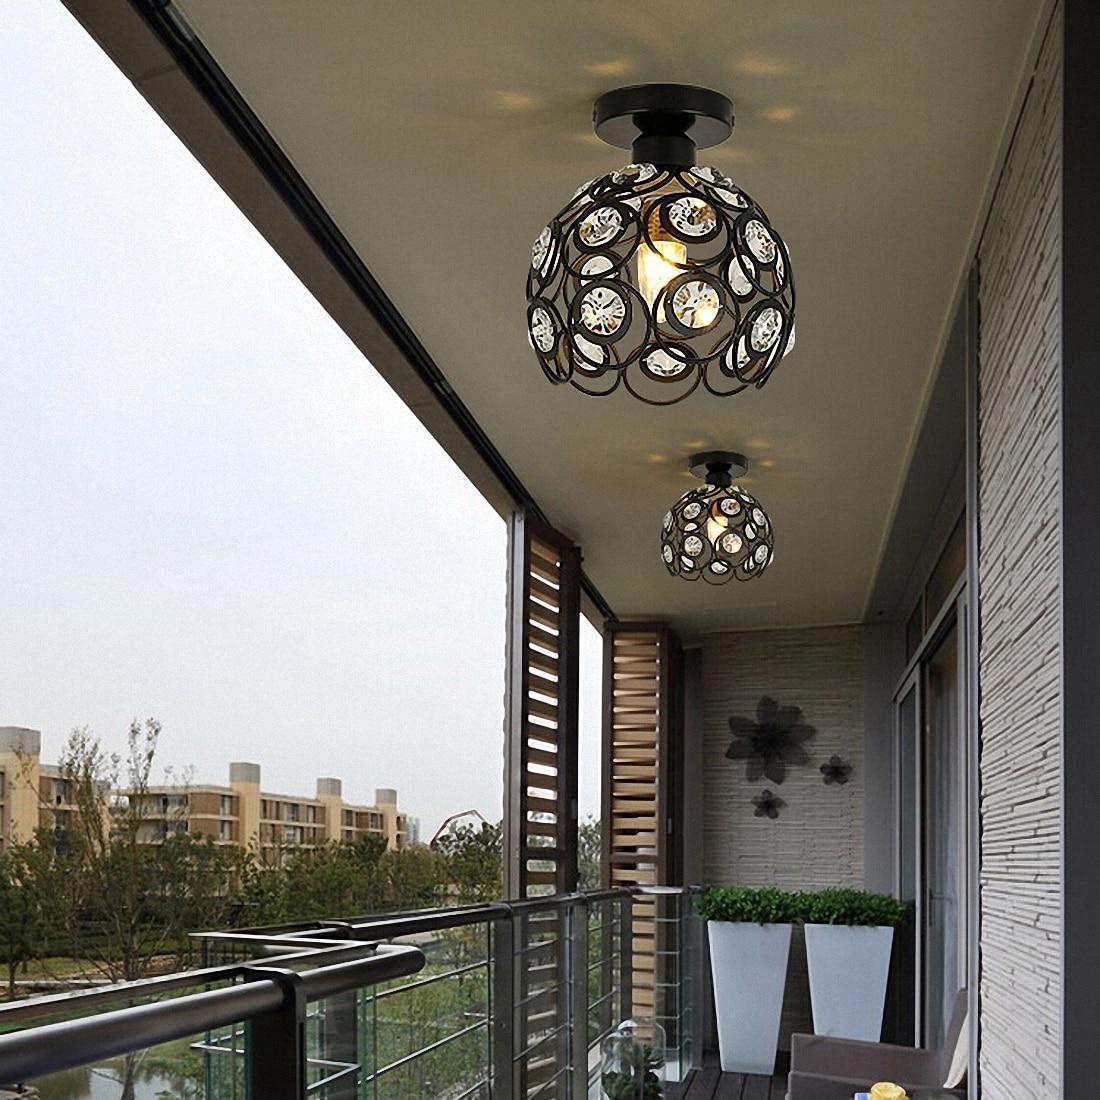 HTB1v9nDcFmWBuNjSspdq6zugXXaR E27 black Creative crystal minimalist ceiling light Single wall ceiling lamp bedroom lamp Single European iron lamp Crystal la